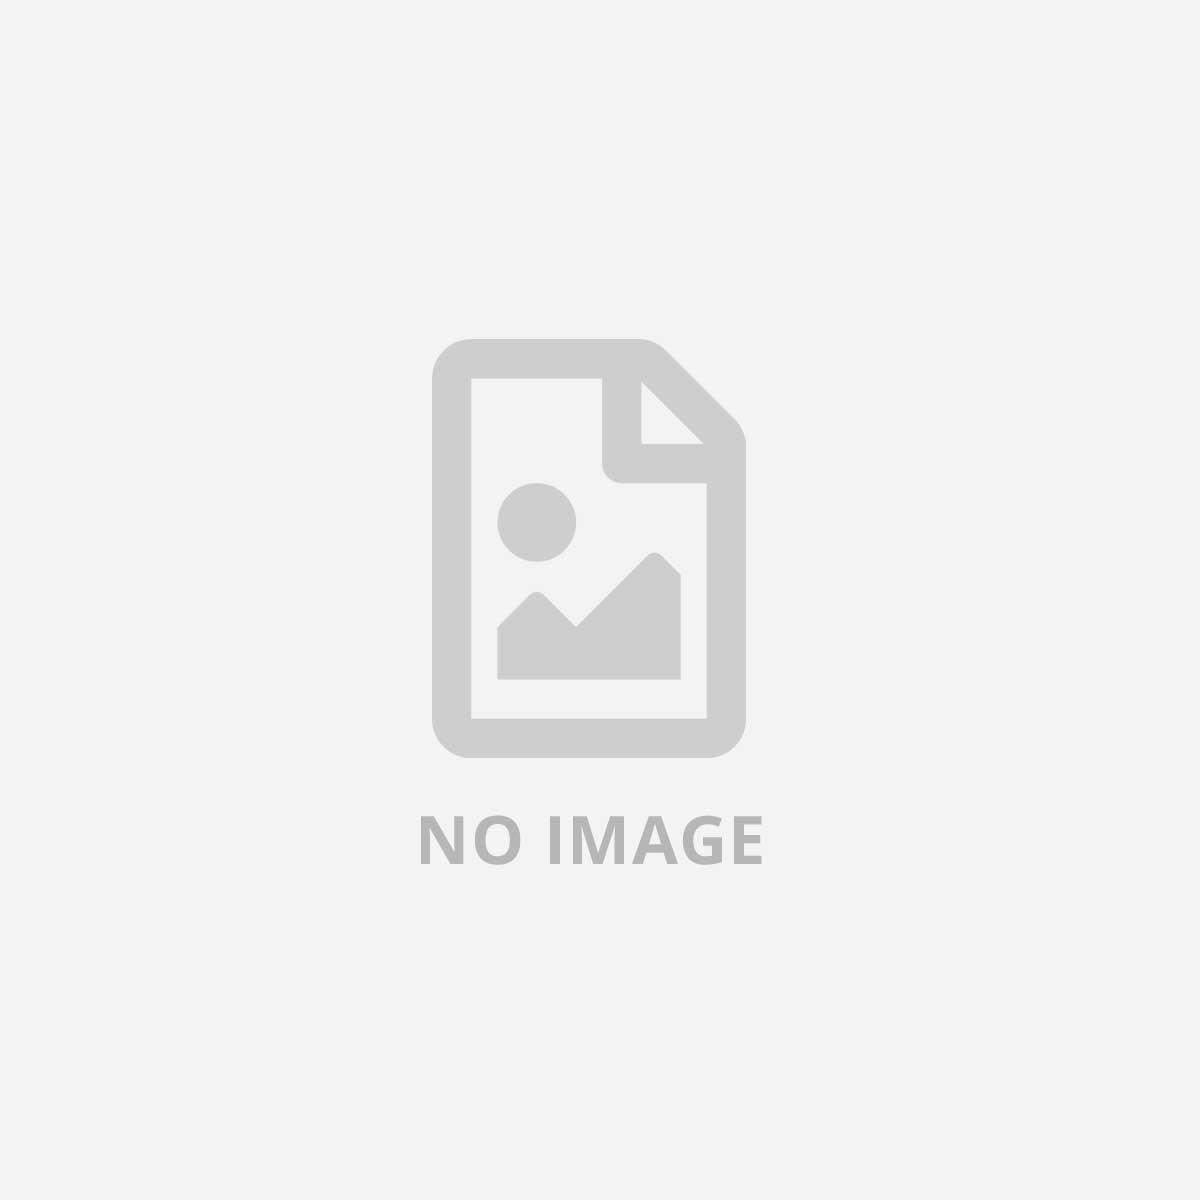 WACOM BAMBOO STYLUS PUNTE DI RICAMBIO